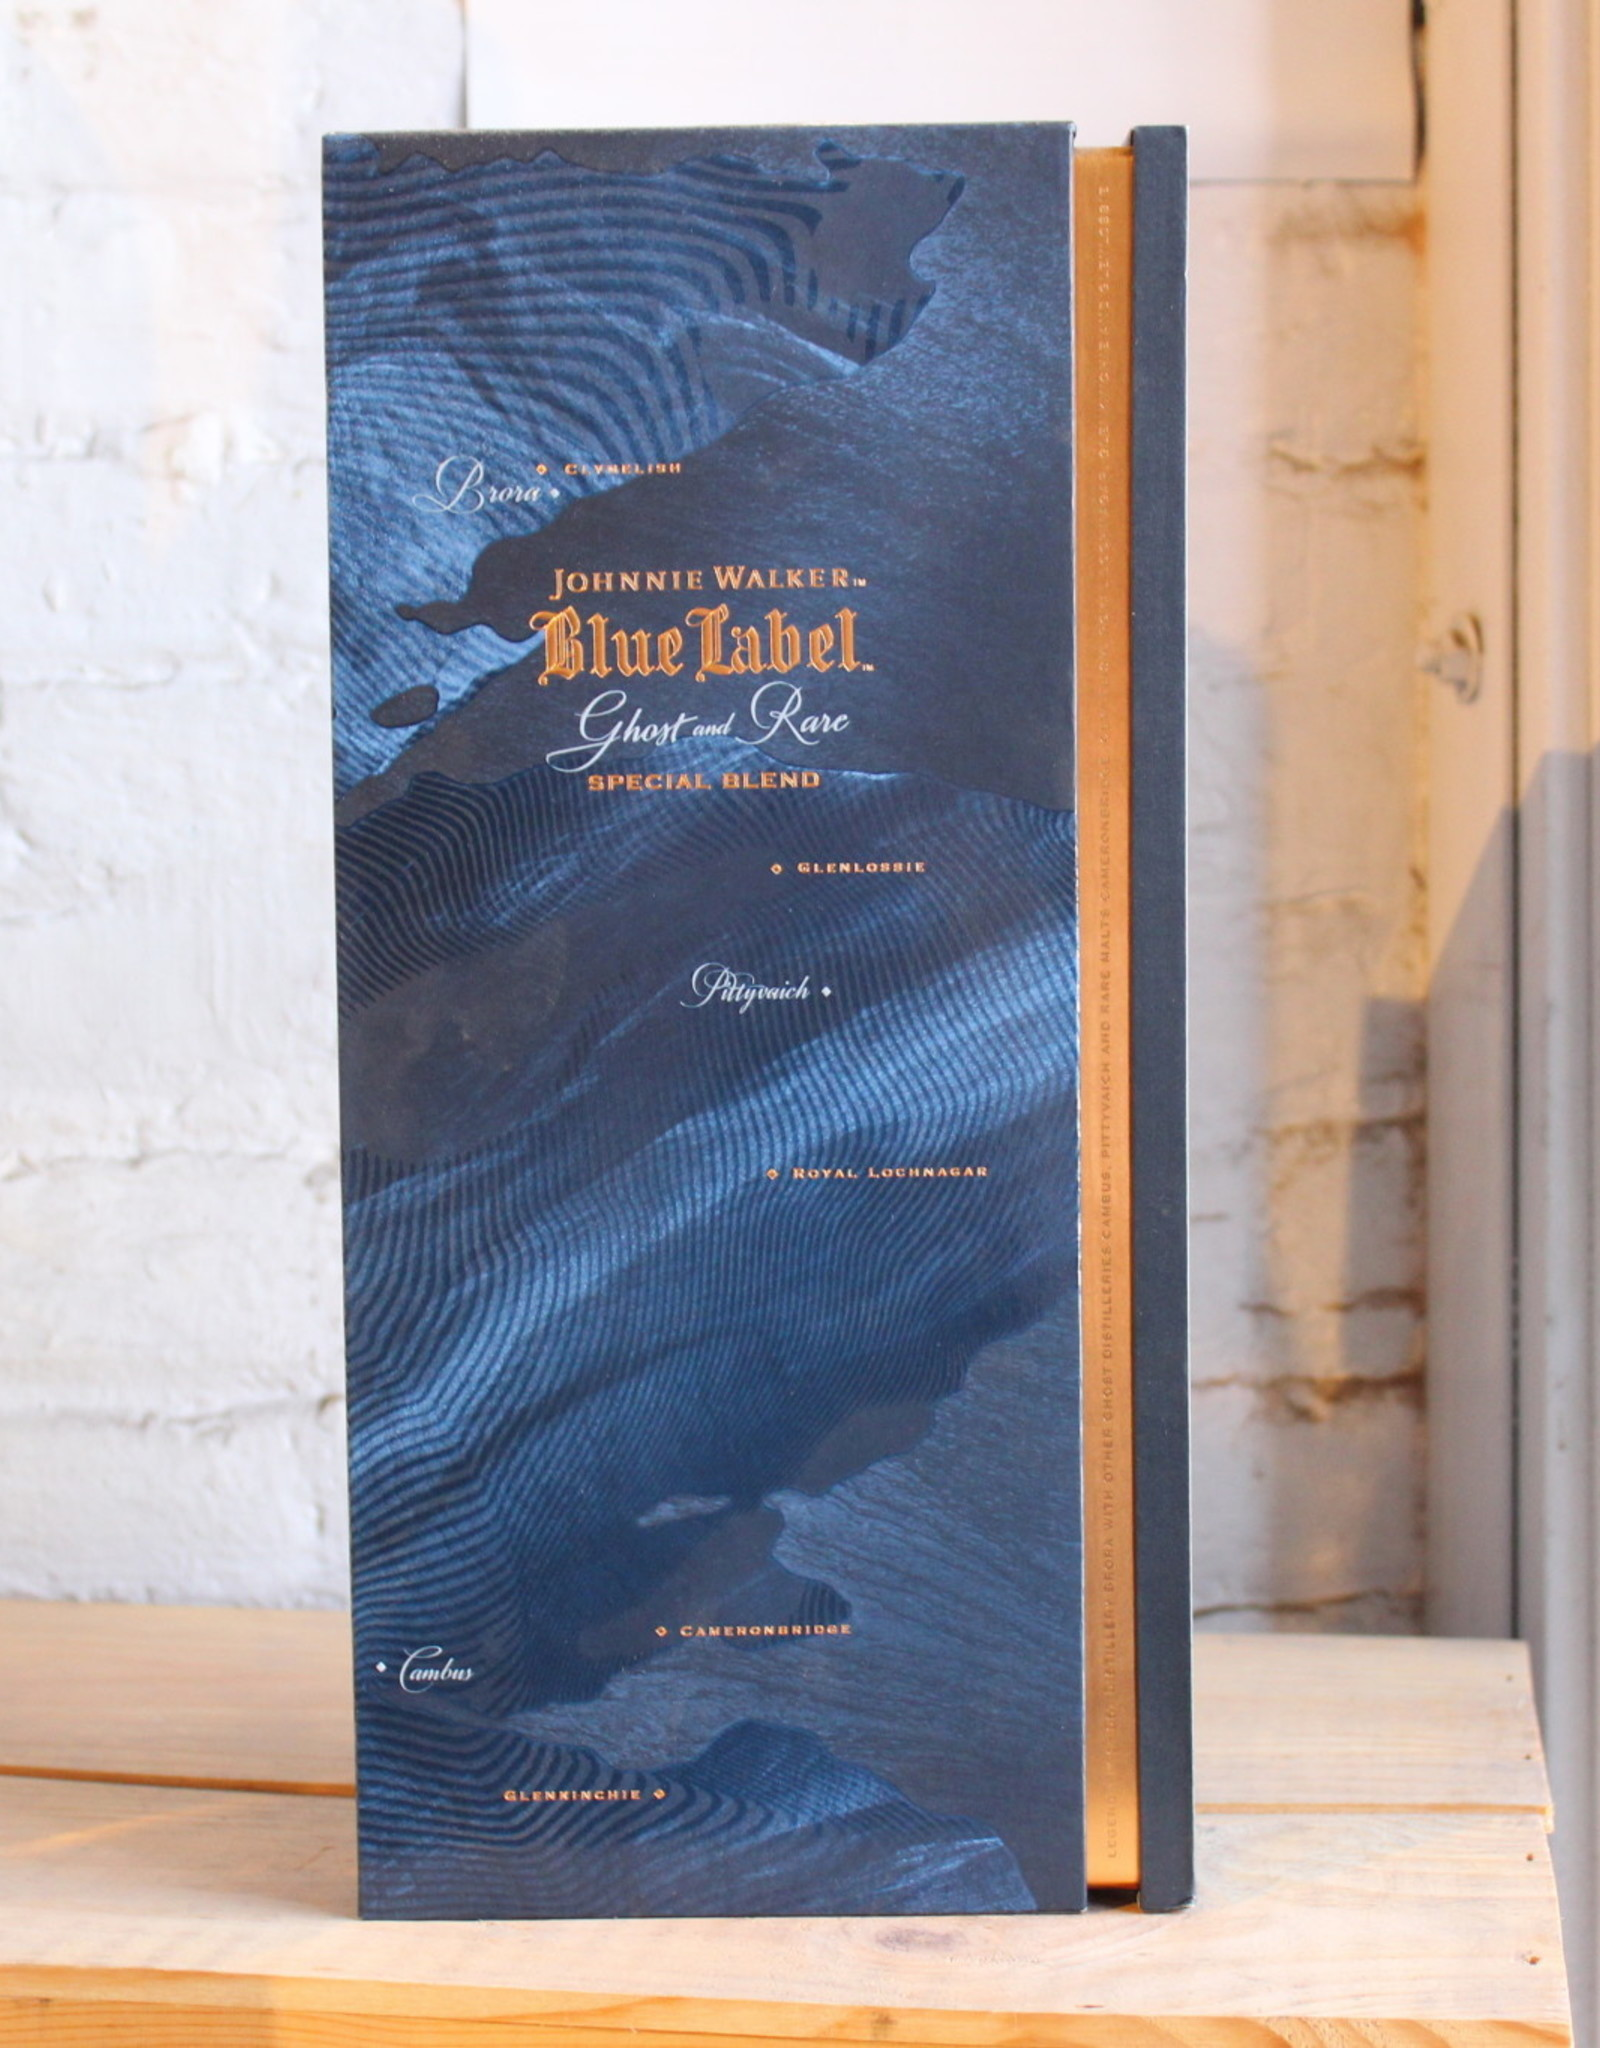 Johnnie Walker Blue Label Ghost & Rare Blended Whisky- Scotland (750ml)